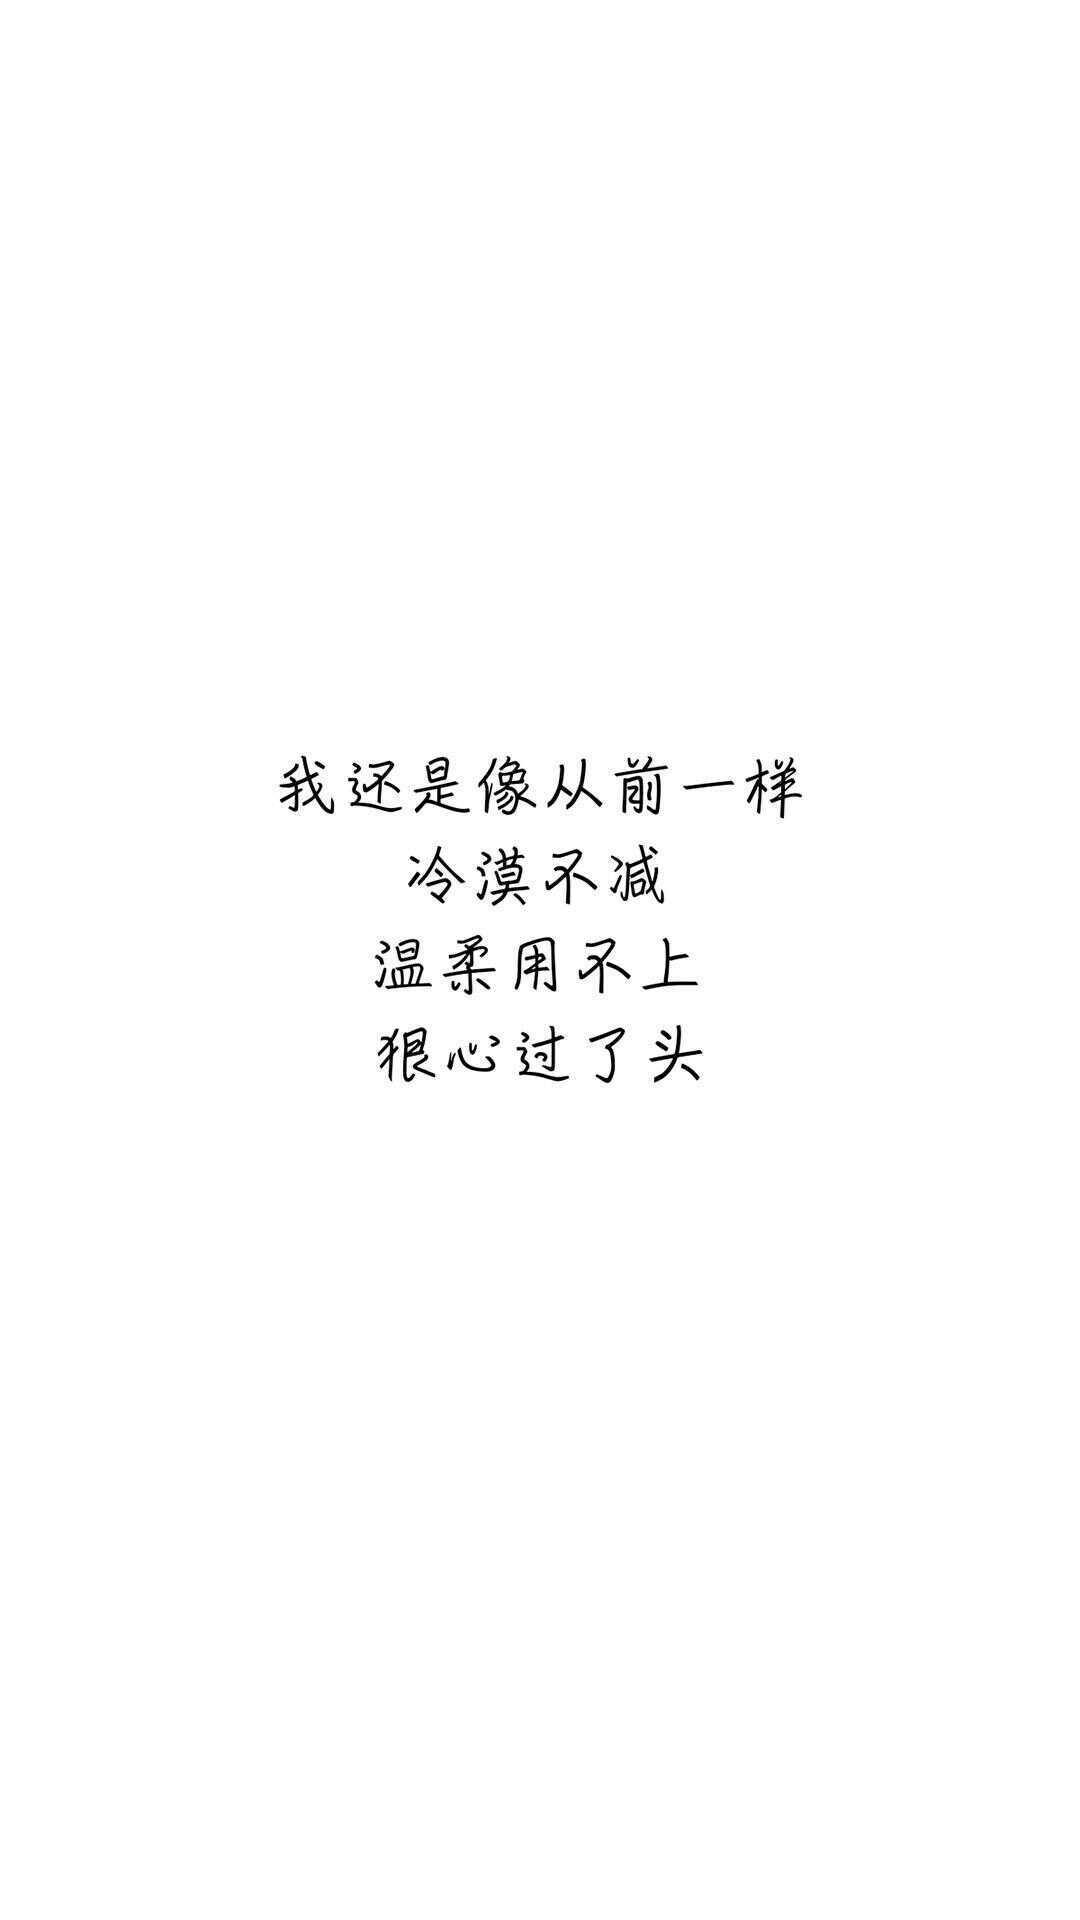 http://www.58100.com/pid/653221.html